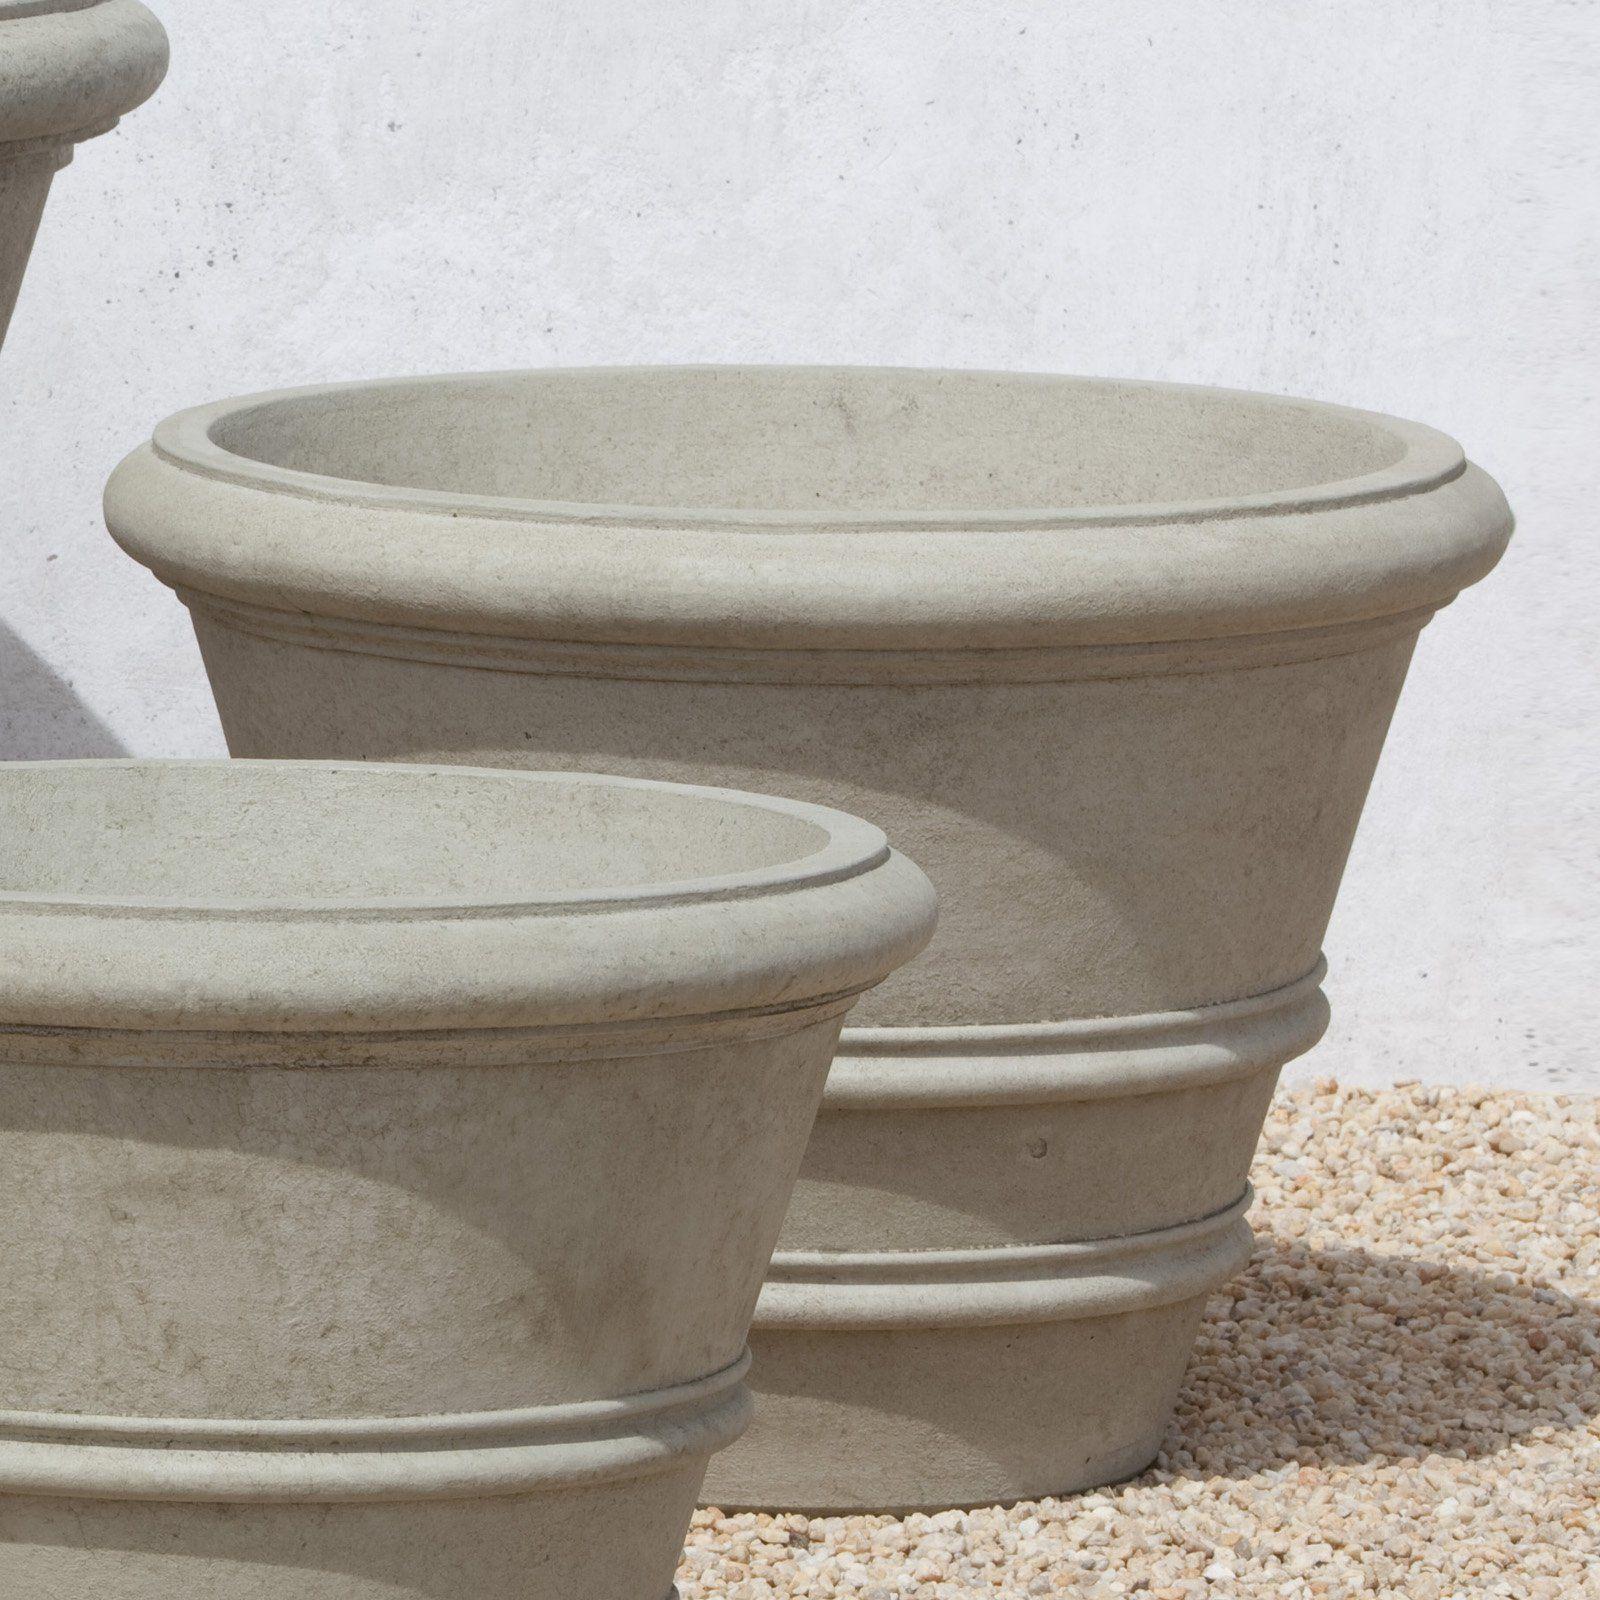 Campania International Classic Rolled Rim Cast Stone Planter 27 In Stone Planters Cast Stone Campania International